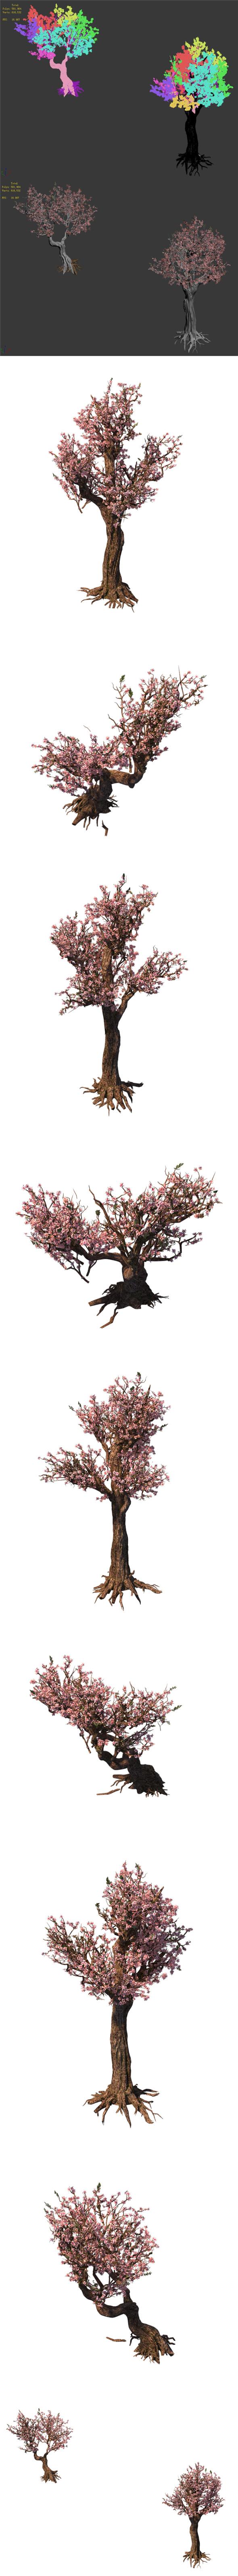 Tree - wonderful fantasy - peach tree 01 - 3DOcean Item for Sale